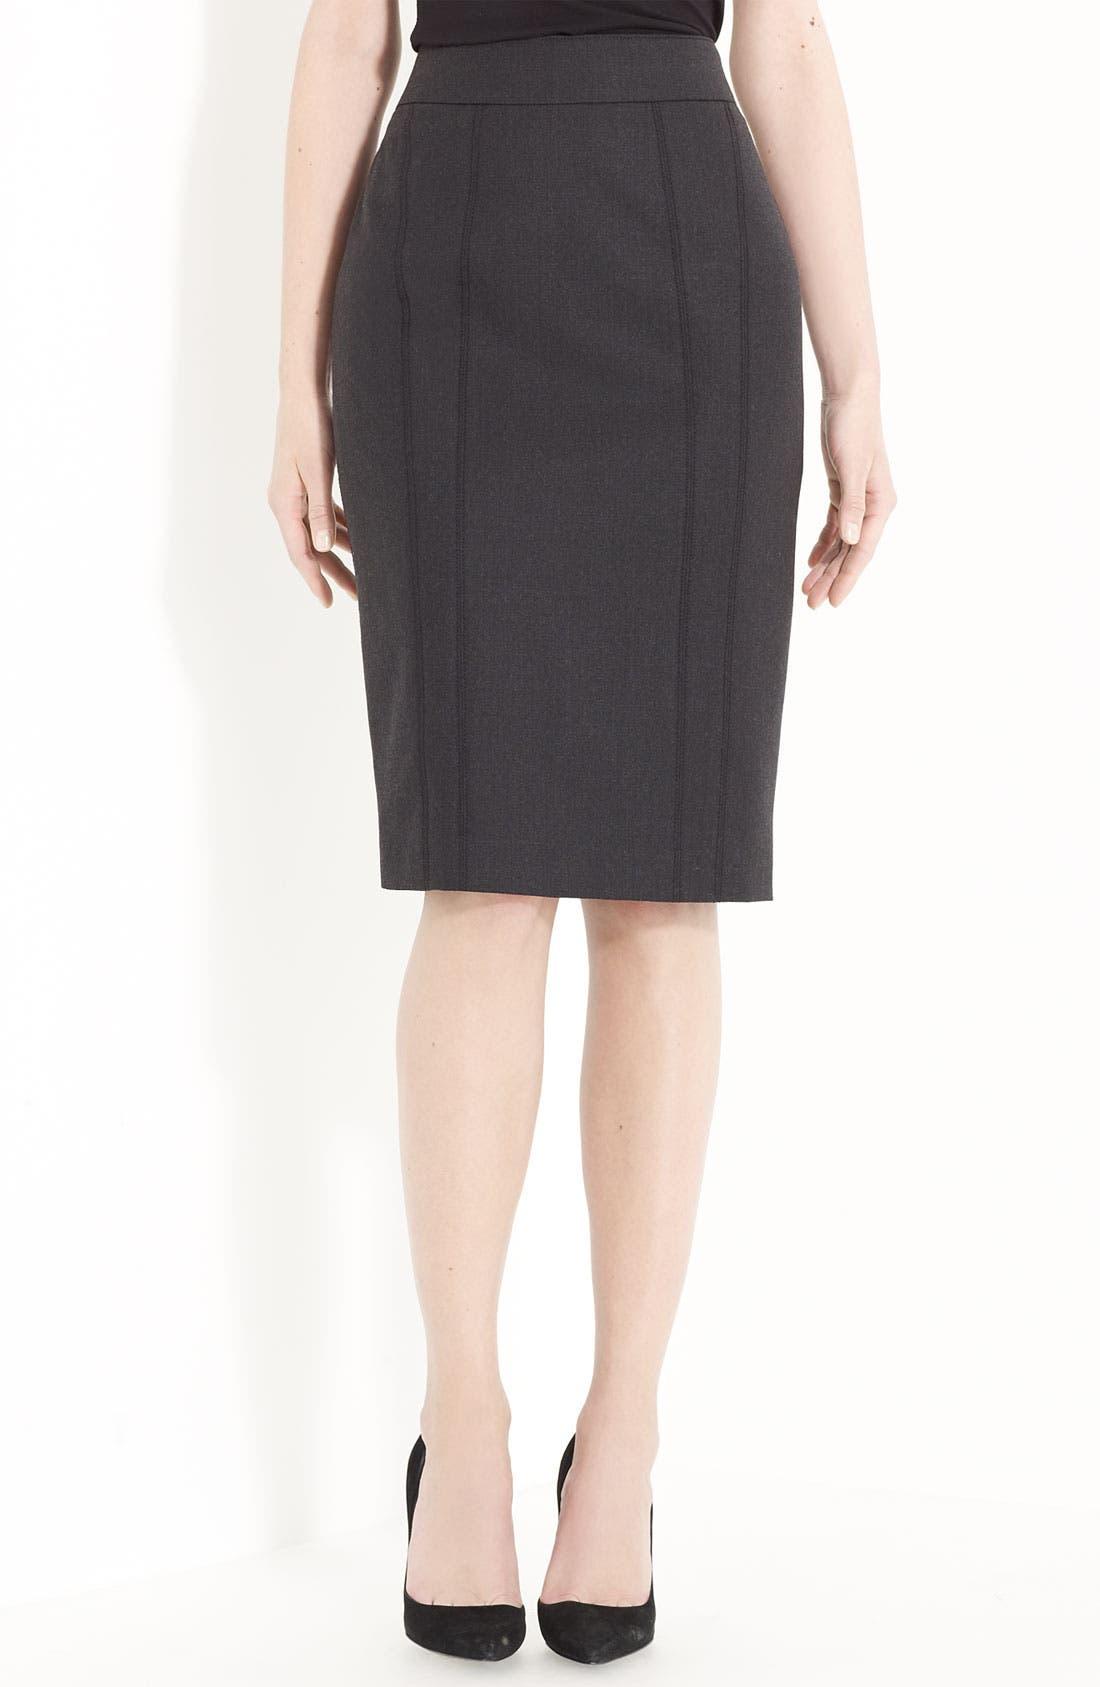 Alternate Image 1 Selected - Armani Collezioni Stretch Flannel Skirt